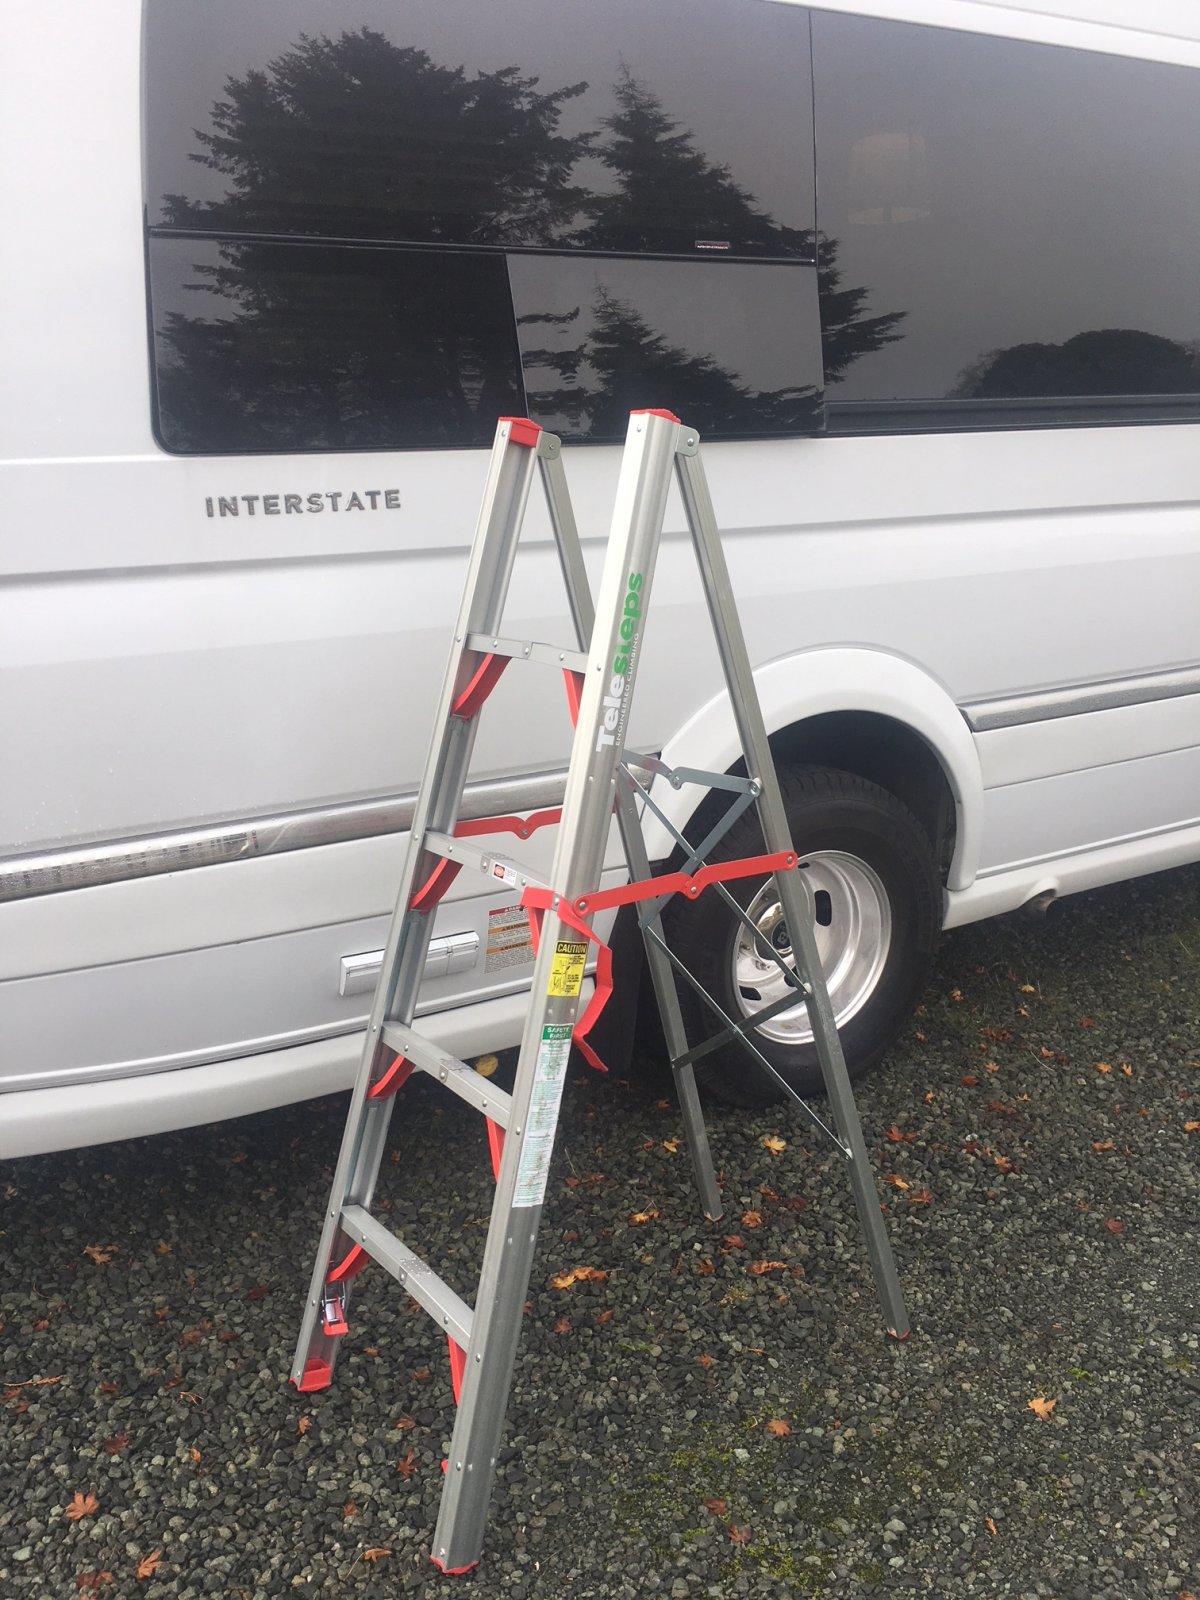 Click image for larger version  Name:TeleSteps Ladder.jpg Views:23 Size:333.9 KB ID:328010